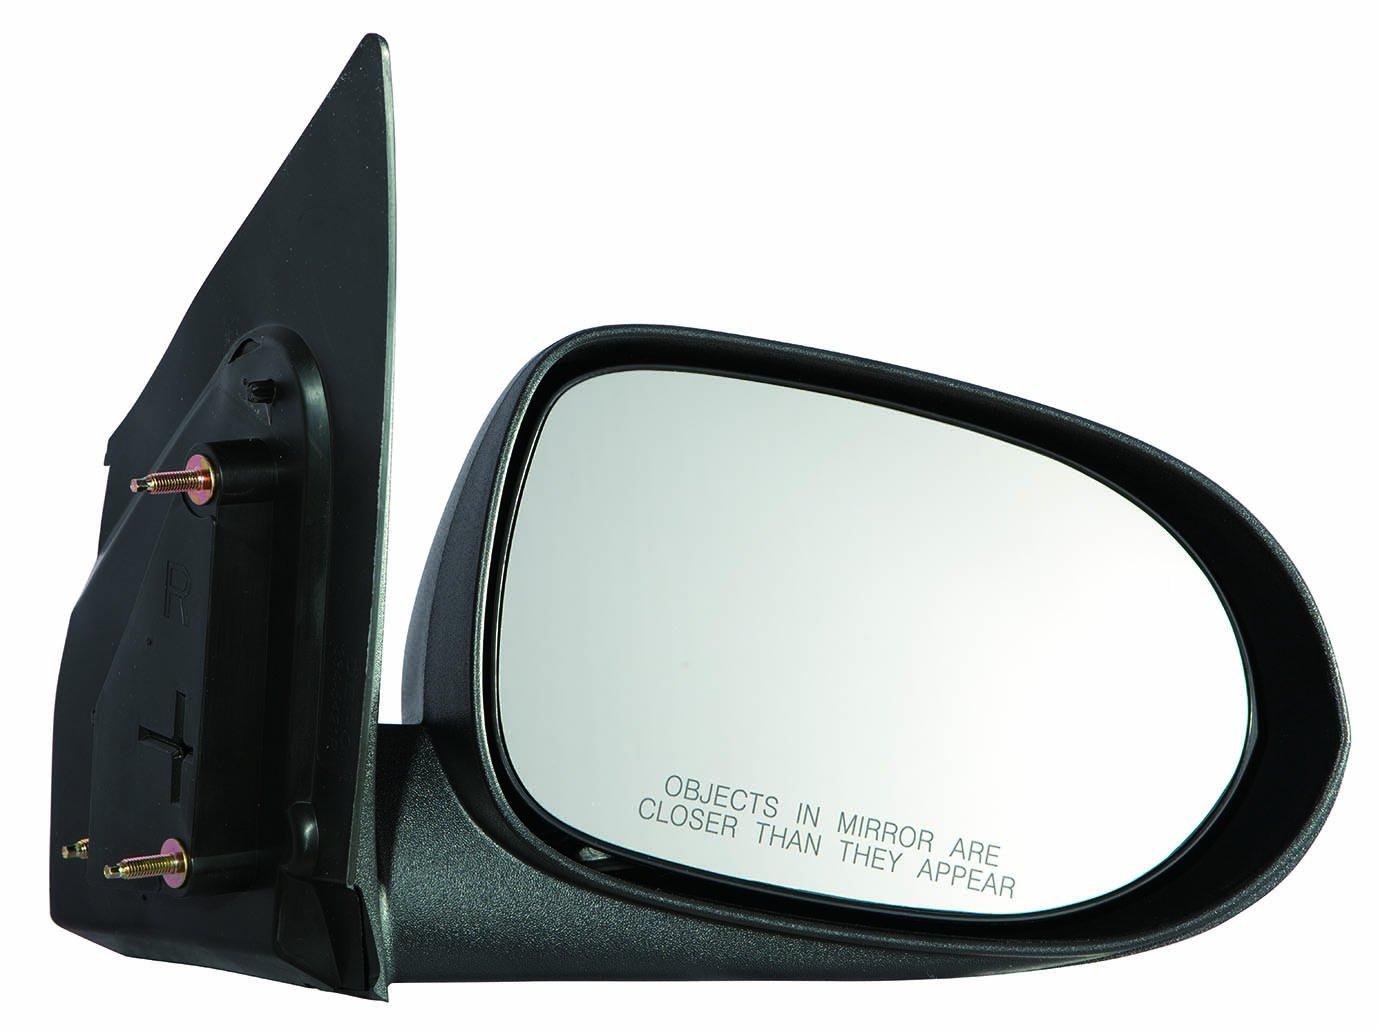 Depo 334-5421R3MF Dodge Caliber Passenger Side Manual Mirror 07-12 Non-Folded Textured